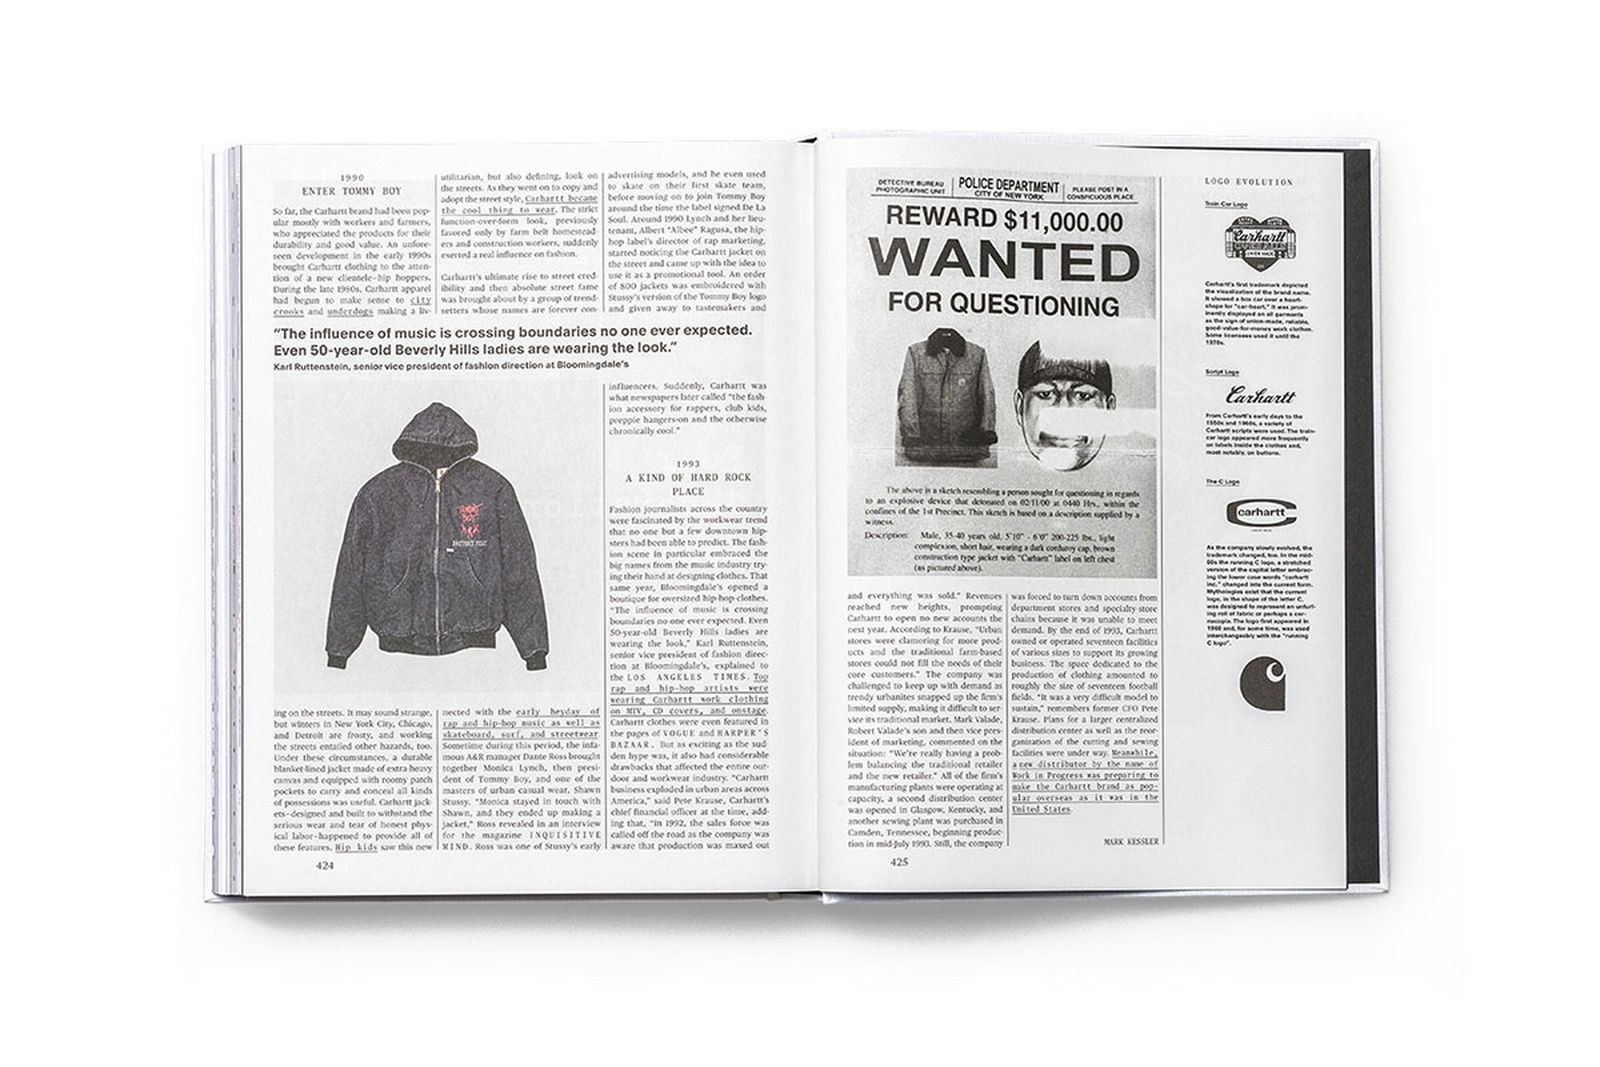 carhartt-wip-archives-streetwear-25-anniversary-24